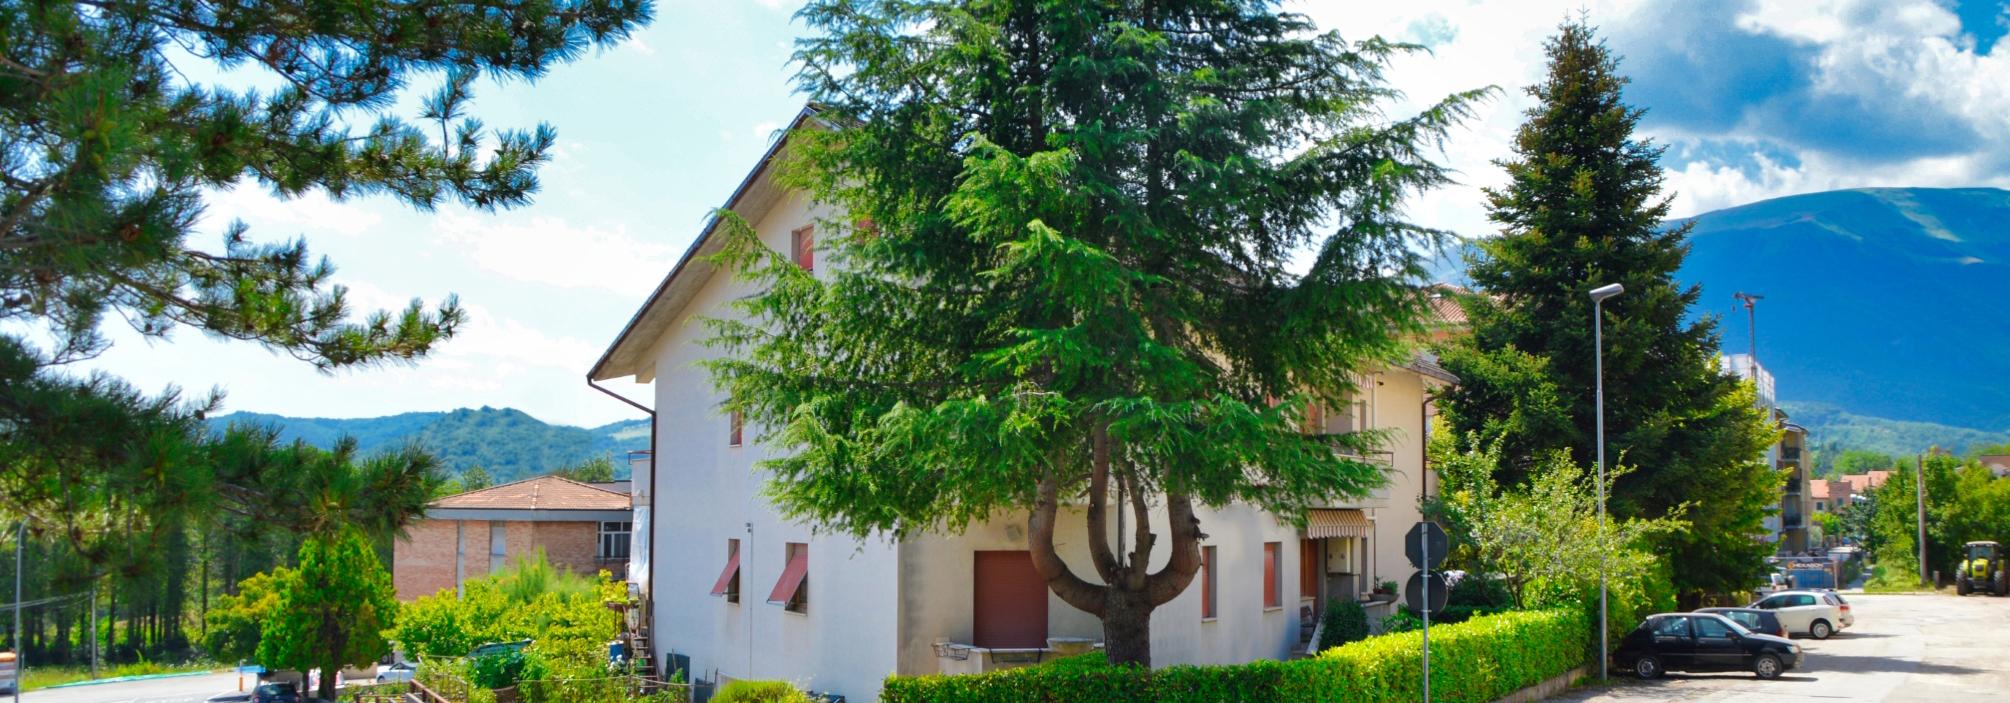 235 – Appartamento centrale Sarnano